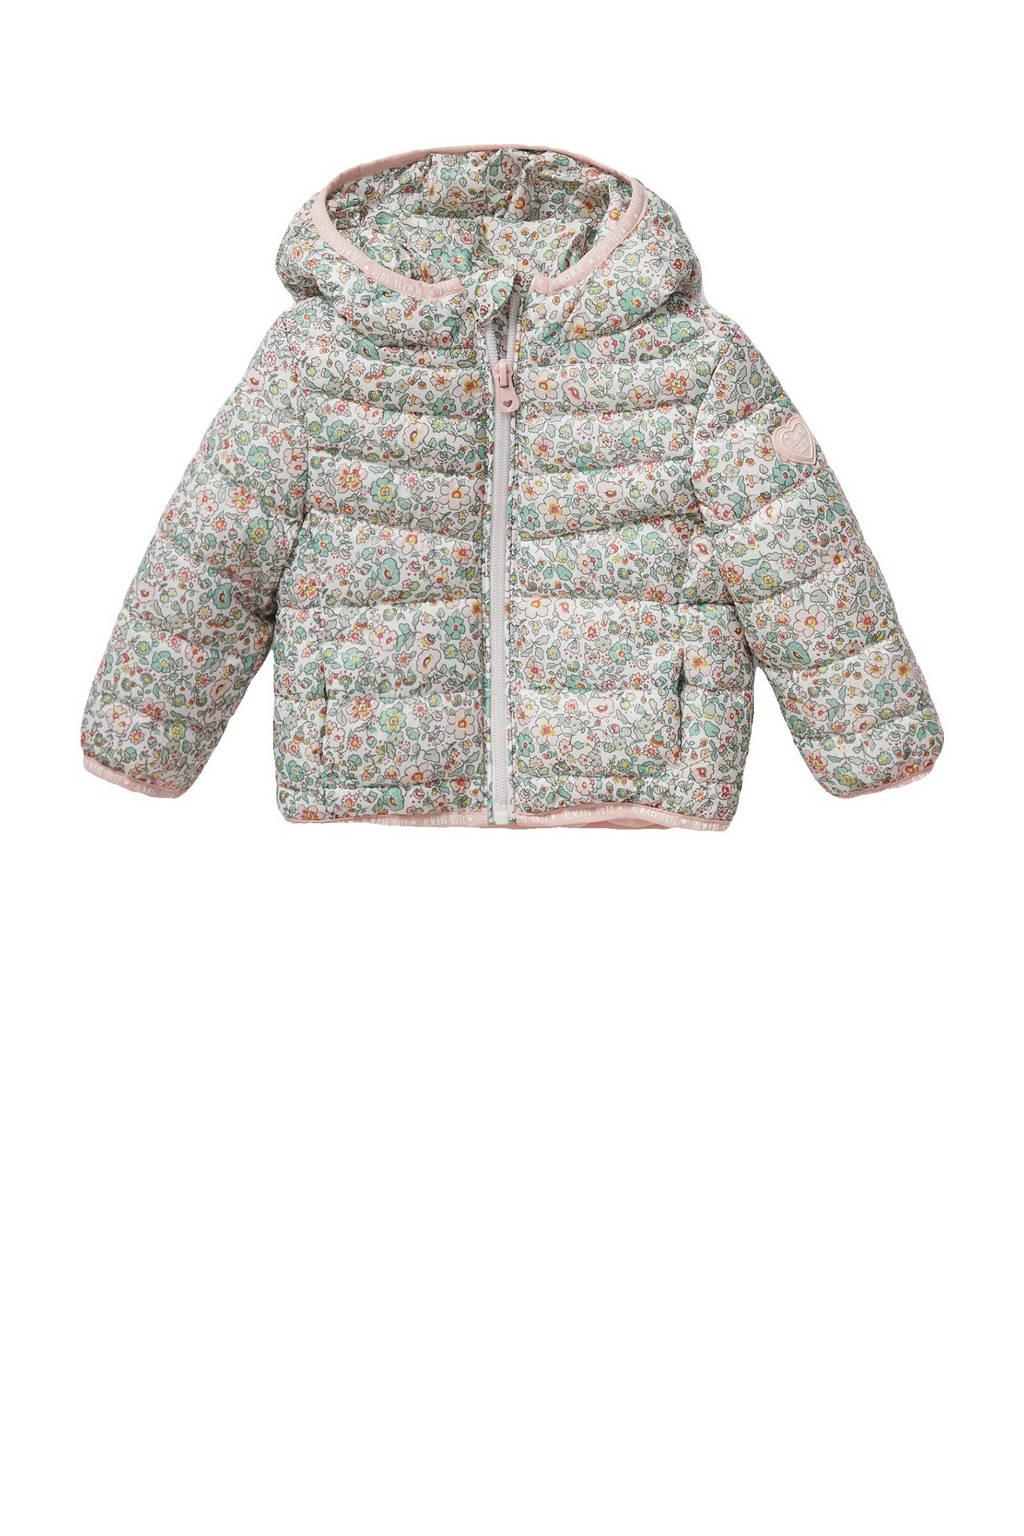 C&A Baby Club baby gewatteerde zomerjas met all over print mintgroen, Mintgroen